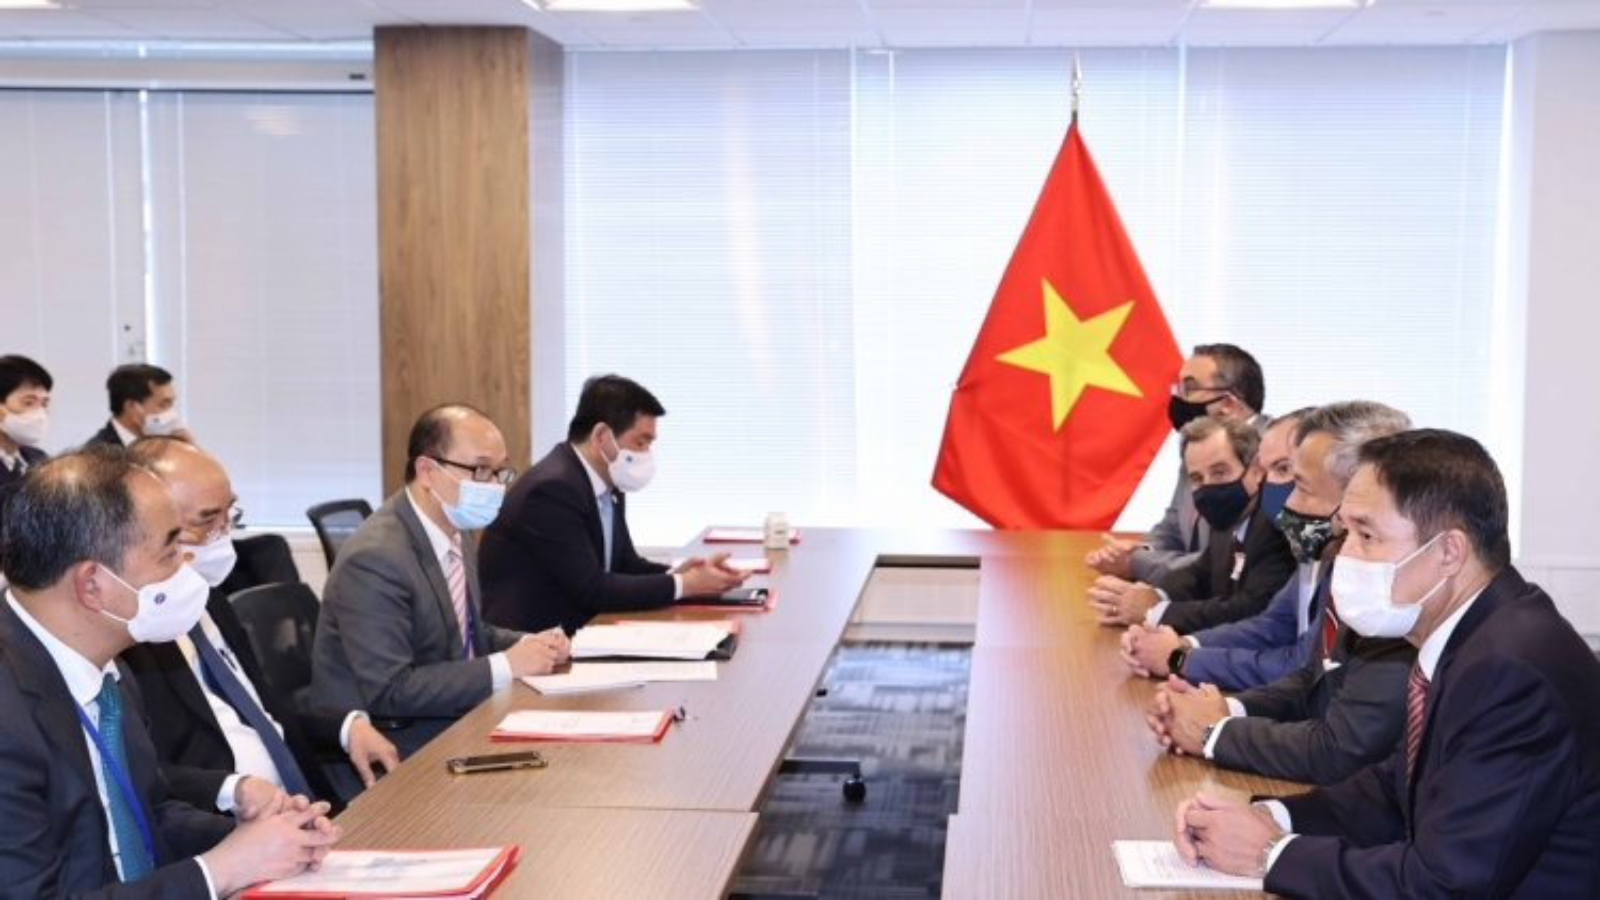 President Phuc appreciative of increased US investment in Vietnam